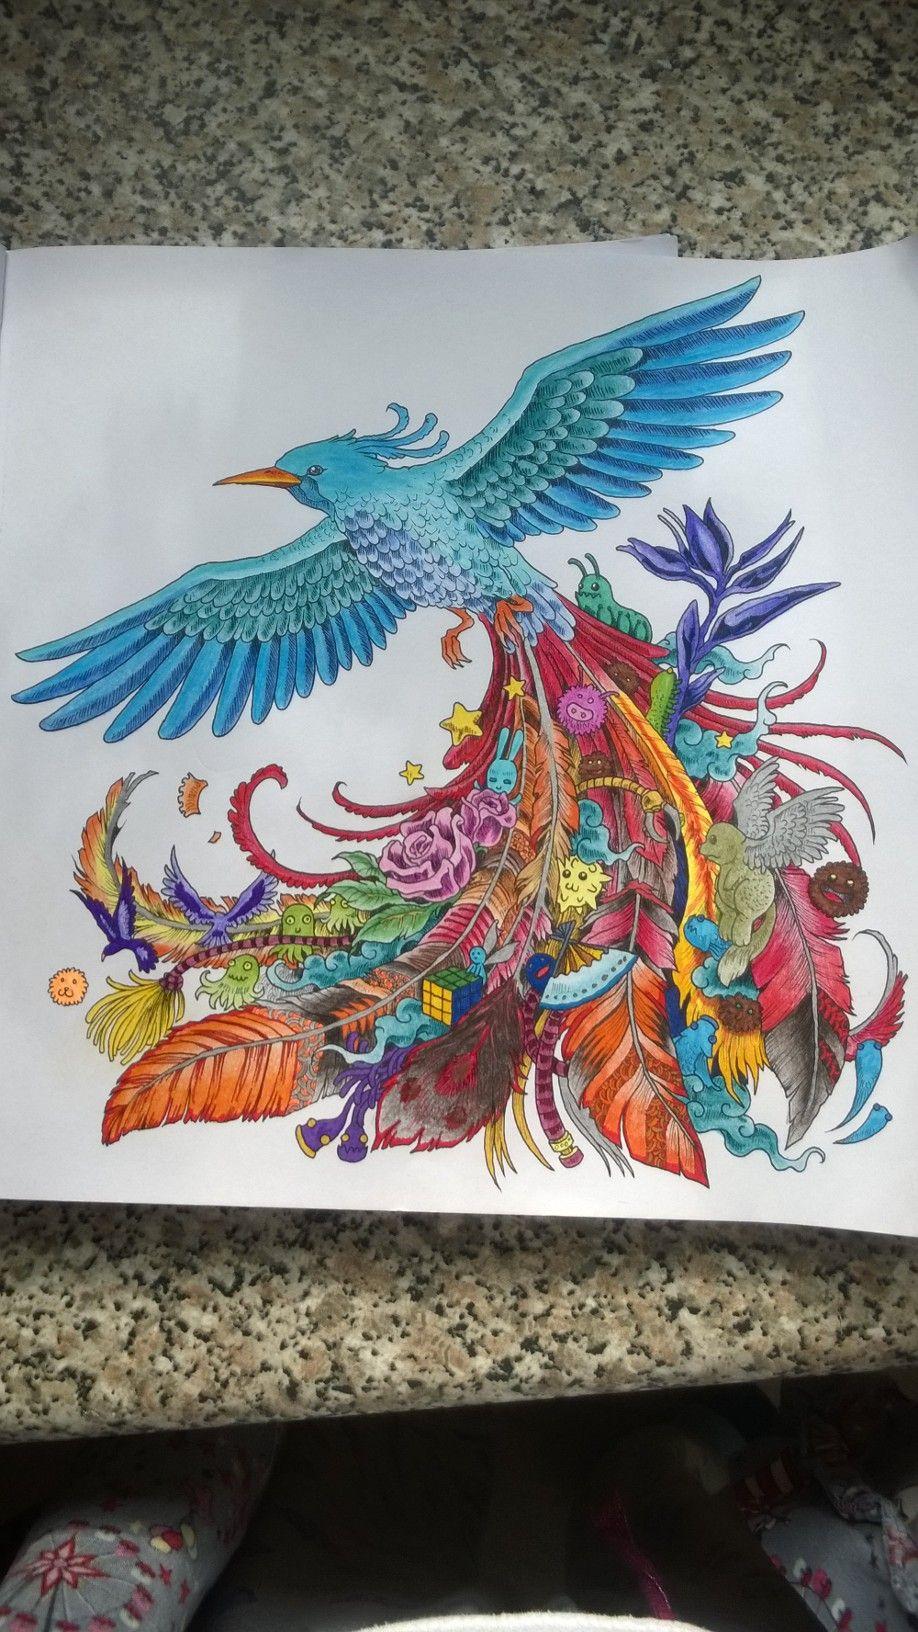 Animorphia Colouring Book Bird 1 By Kaydkay92 Deviantart Com On Deviantart Animorphia Coloring Book Coloring Book Art Coloring Books